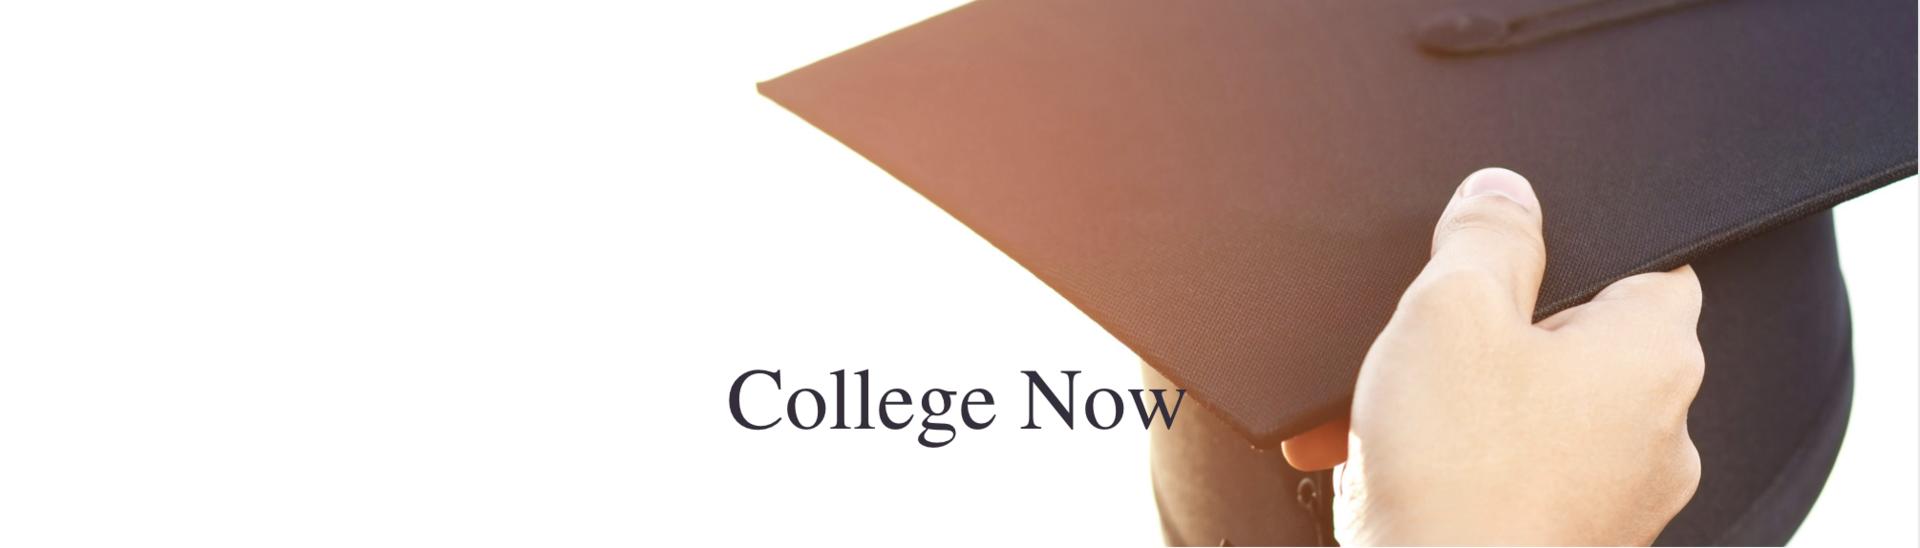 Hand holding a graduation cap